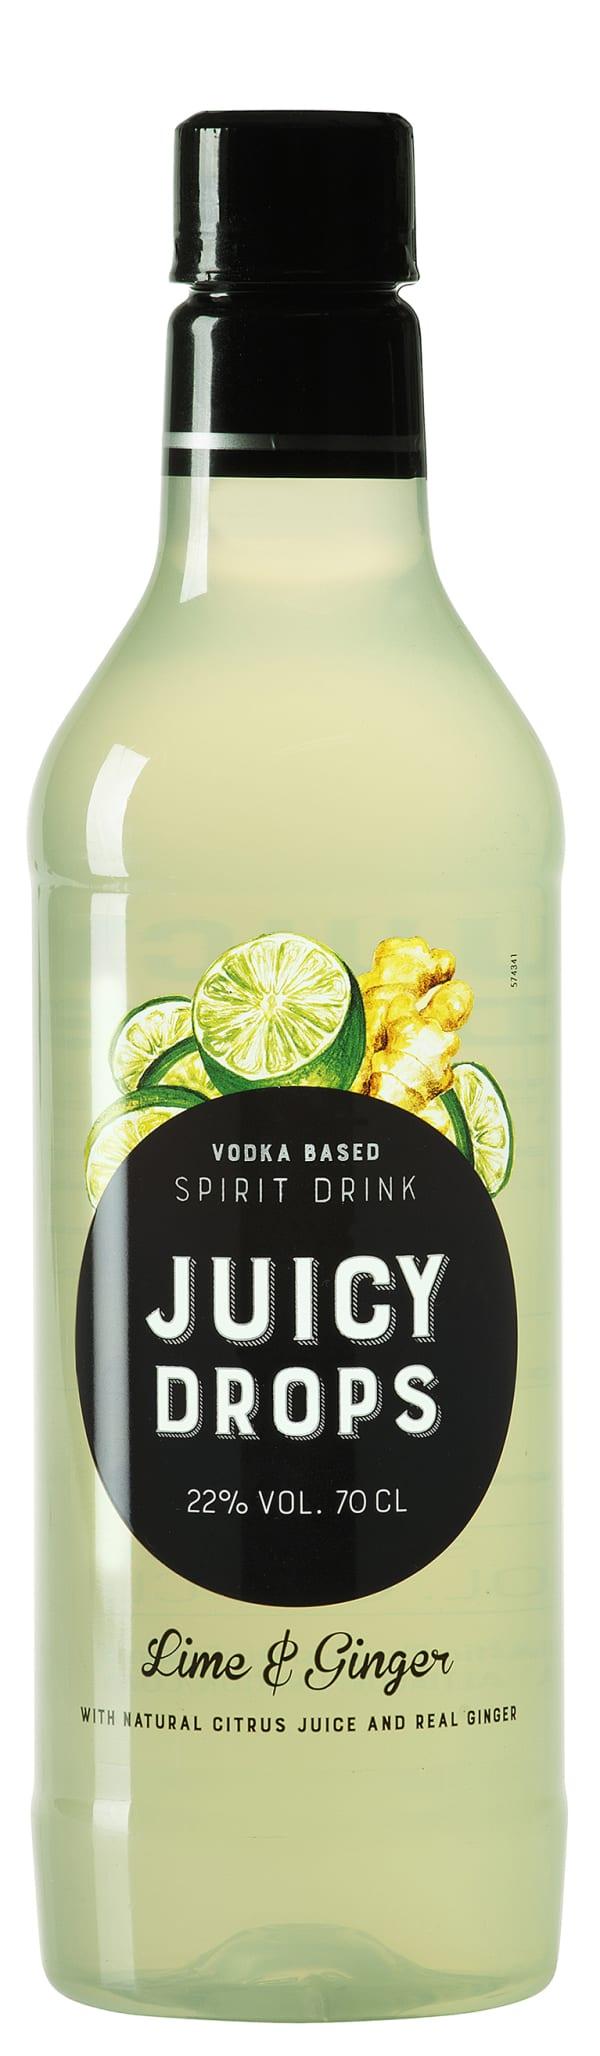 Juicy Drops Lime Ginger plastic bottle